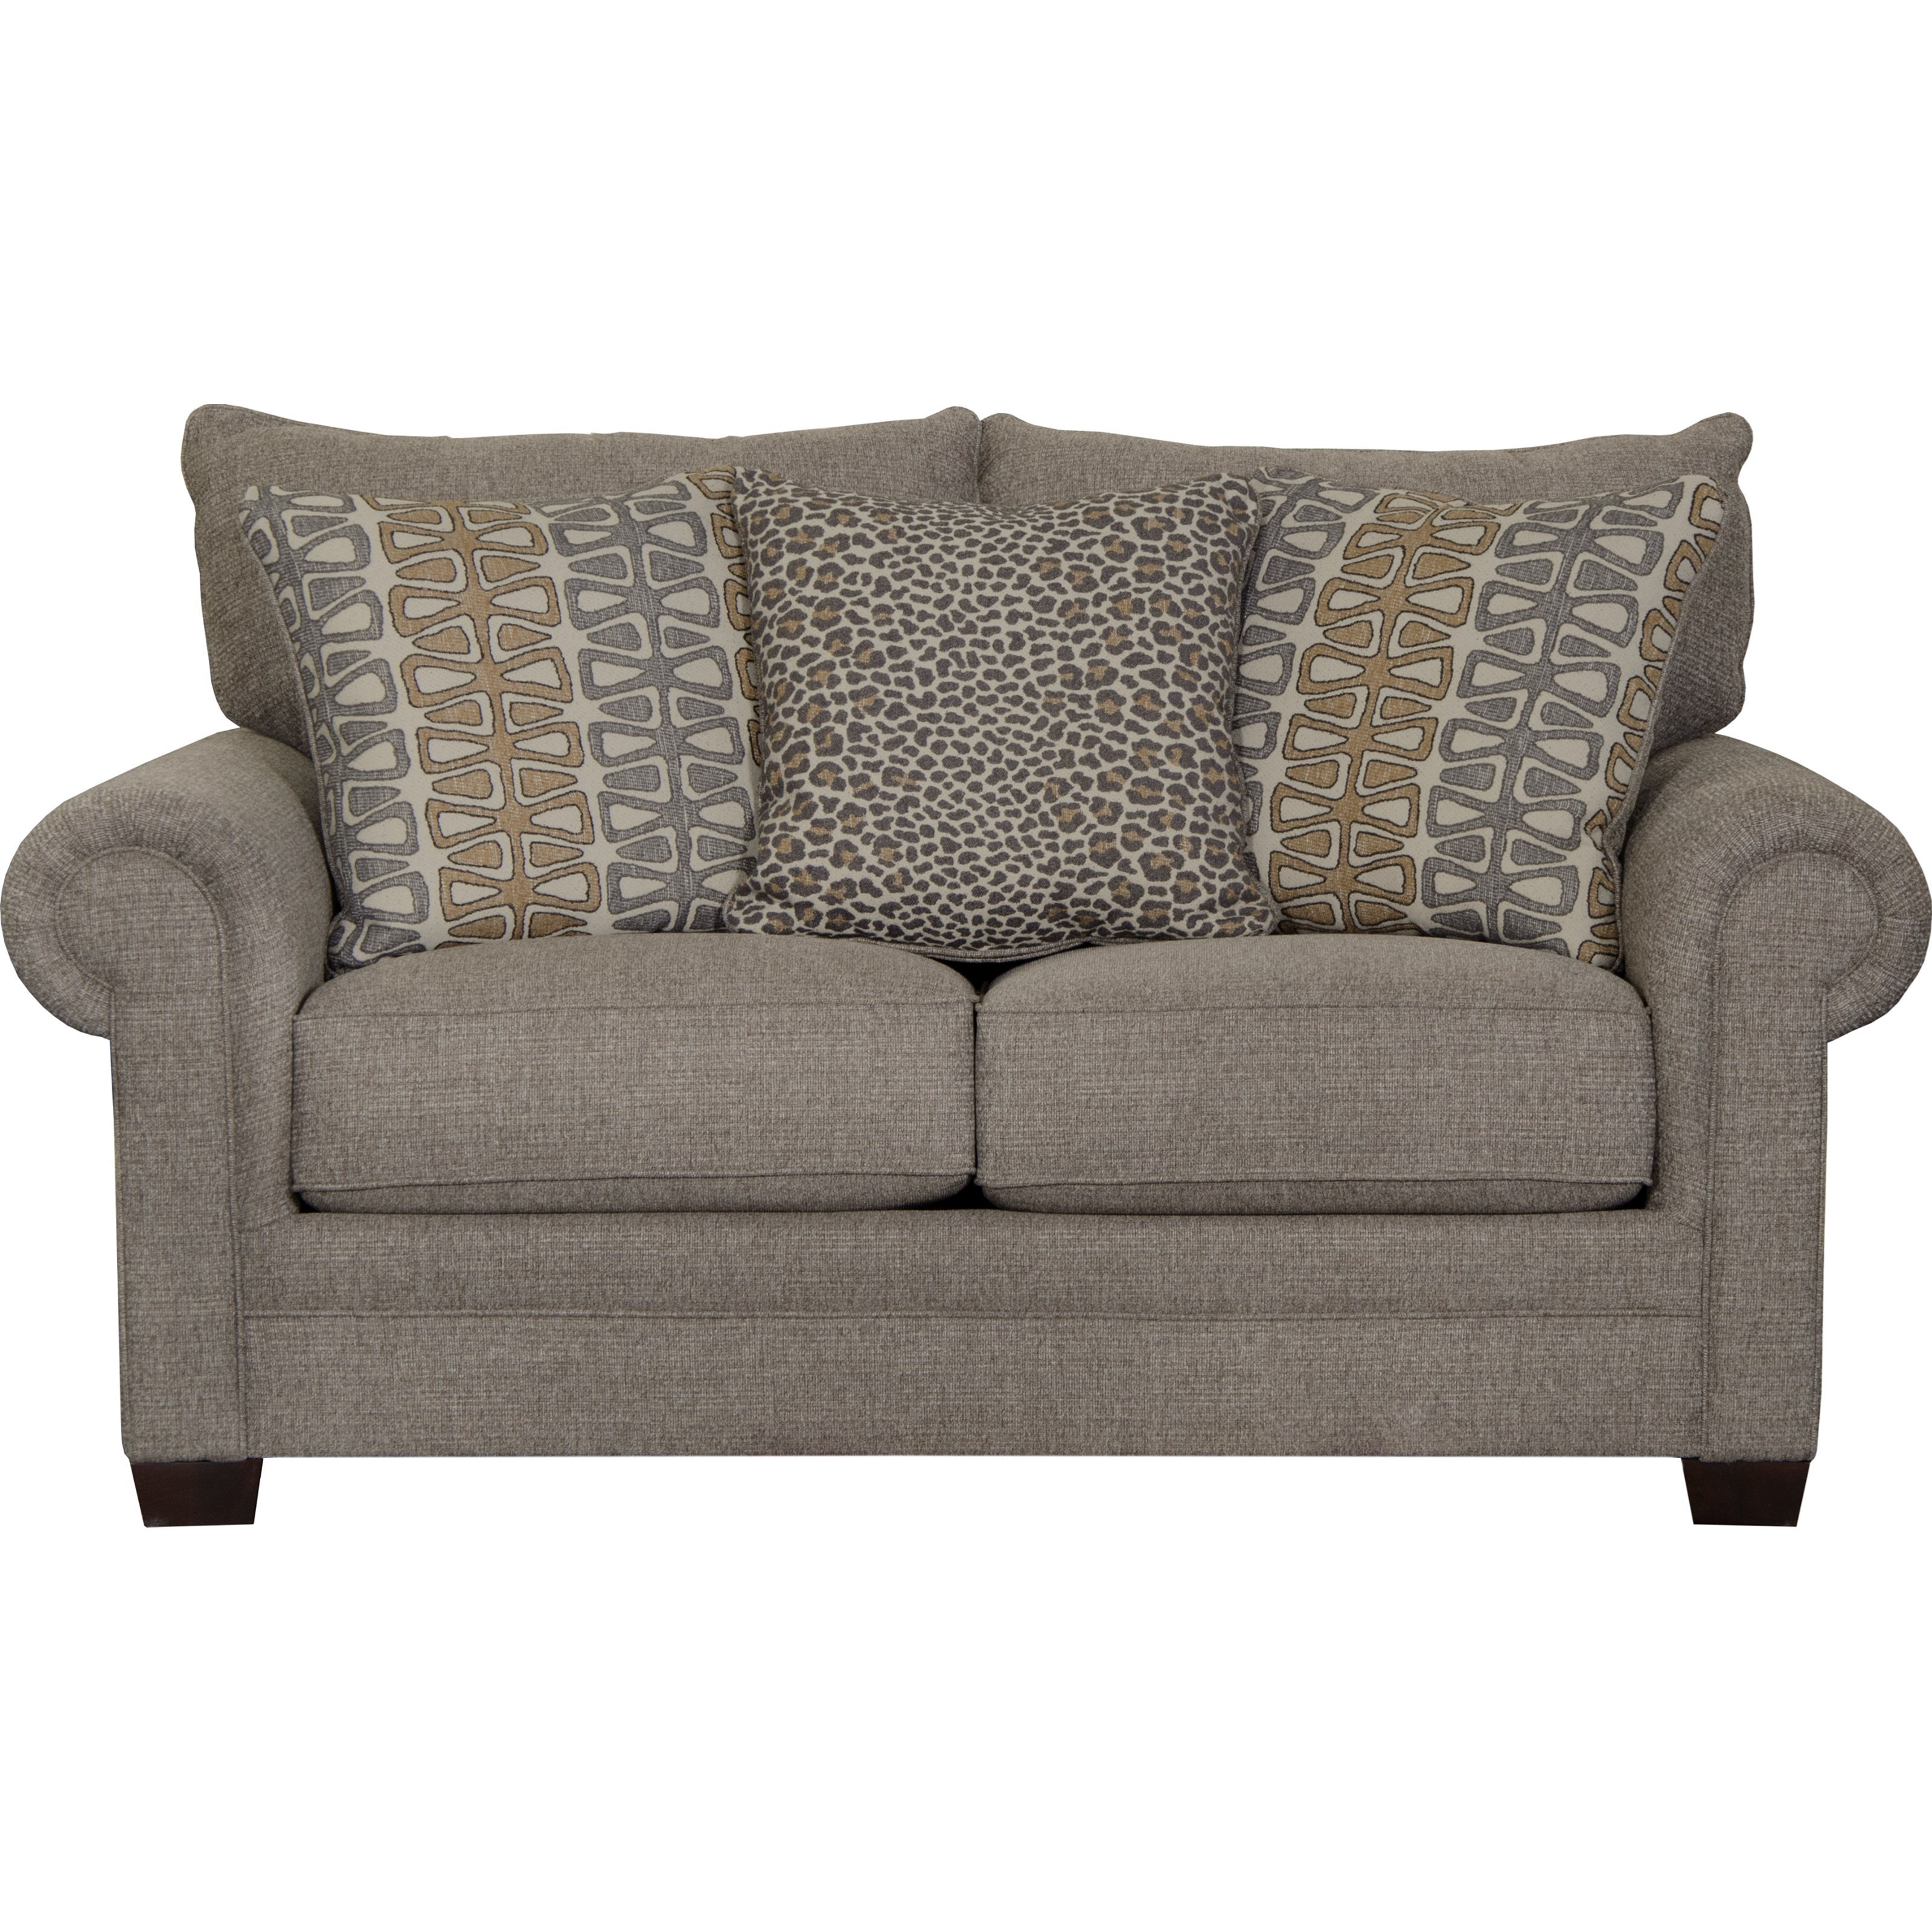 Havana Loveseat by Jackson Furniture at Northeast Factory Direct